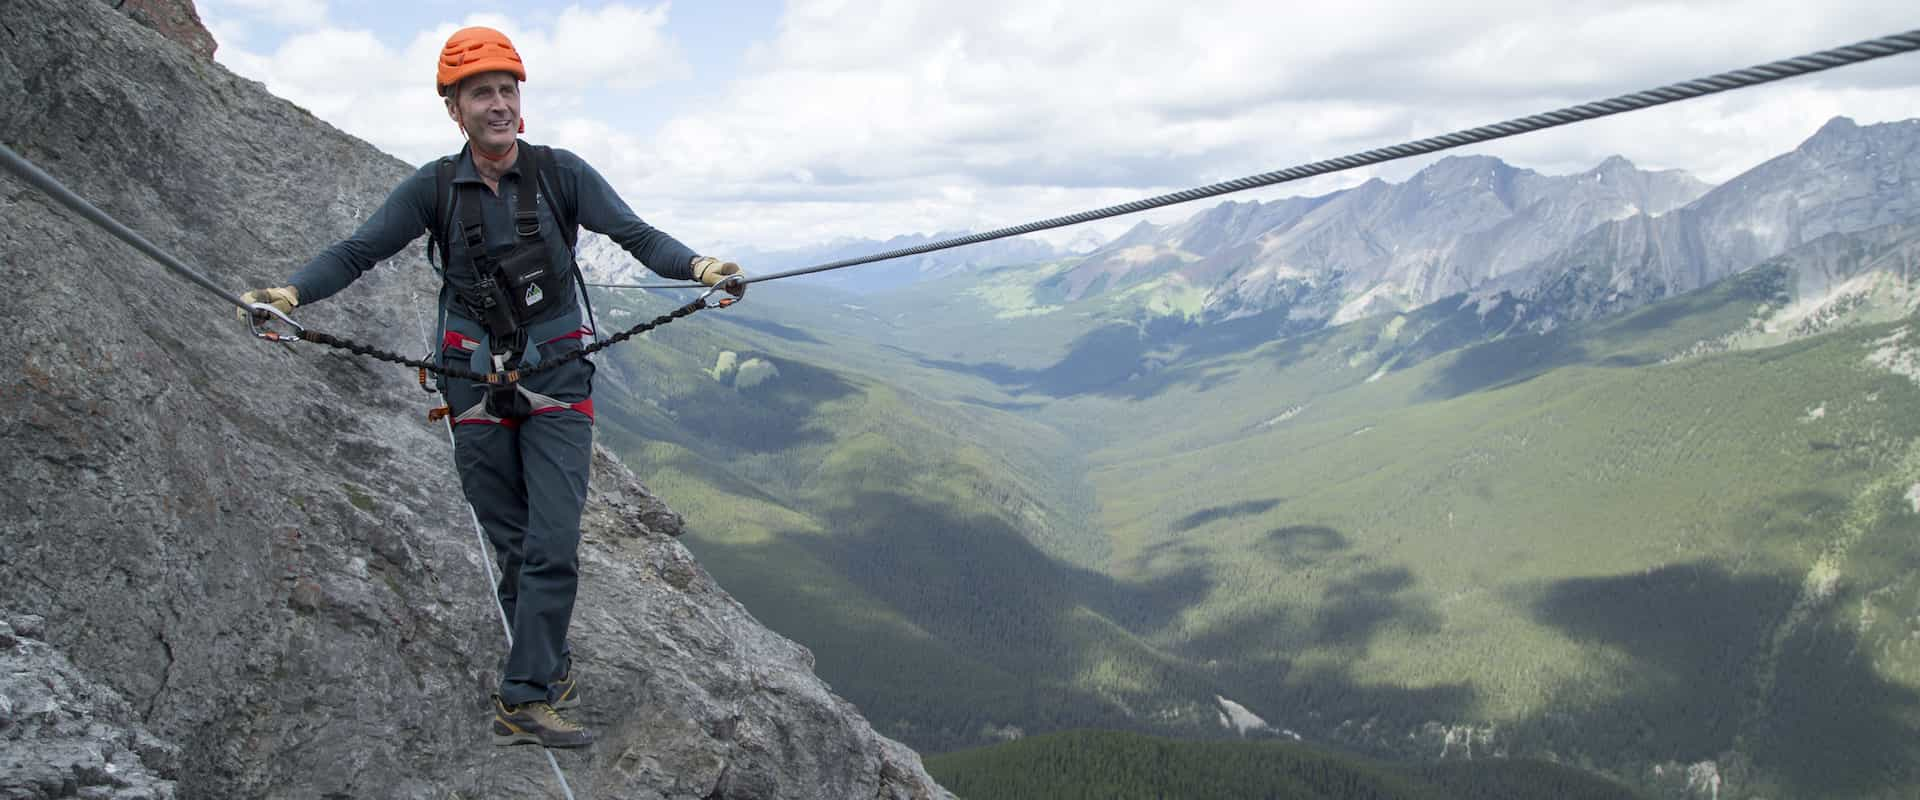 Banff Via Ferrata Summiteer 6 Hours - Discover Banff Tours